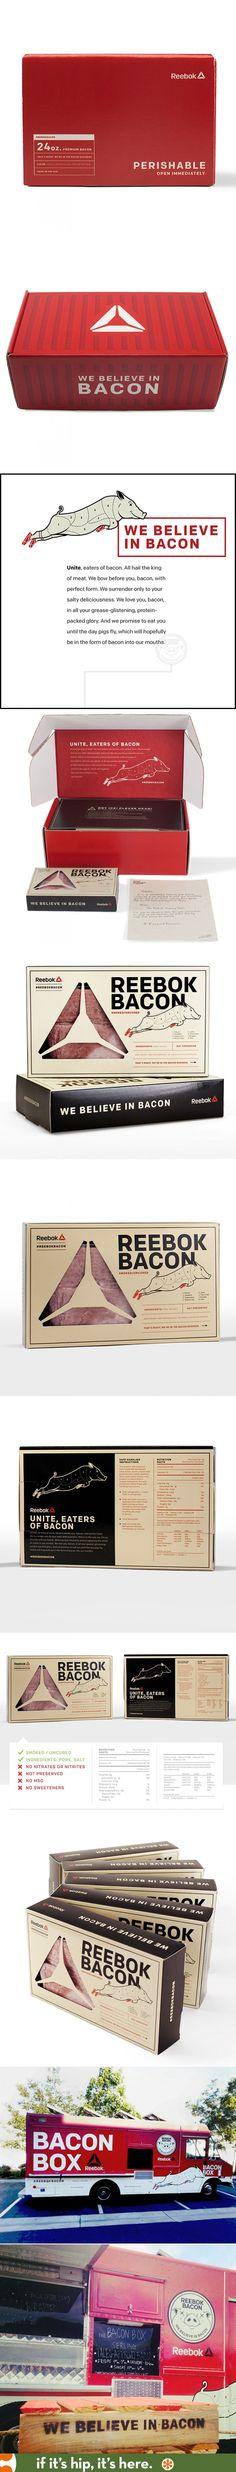 Reebok Bacon package design, food truck design and branding